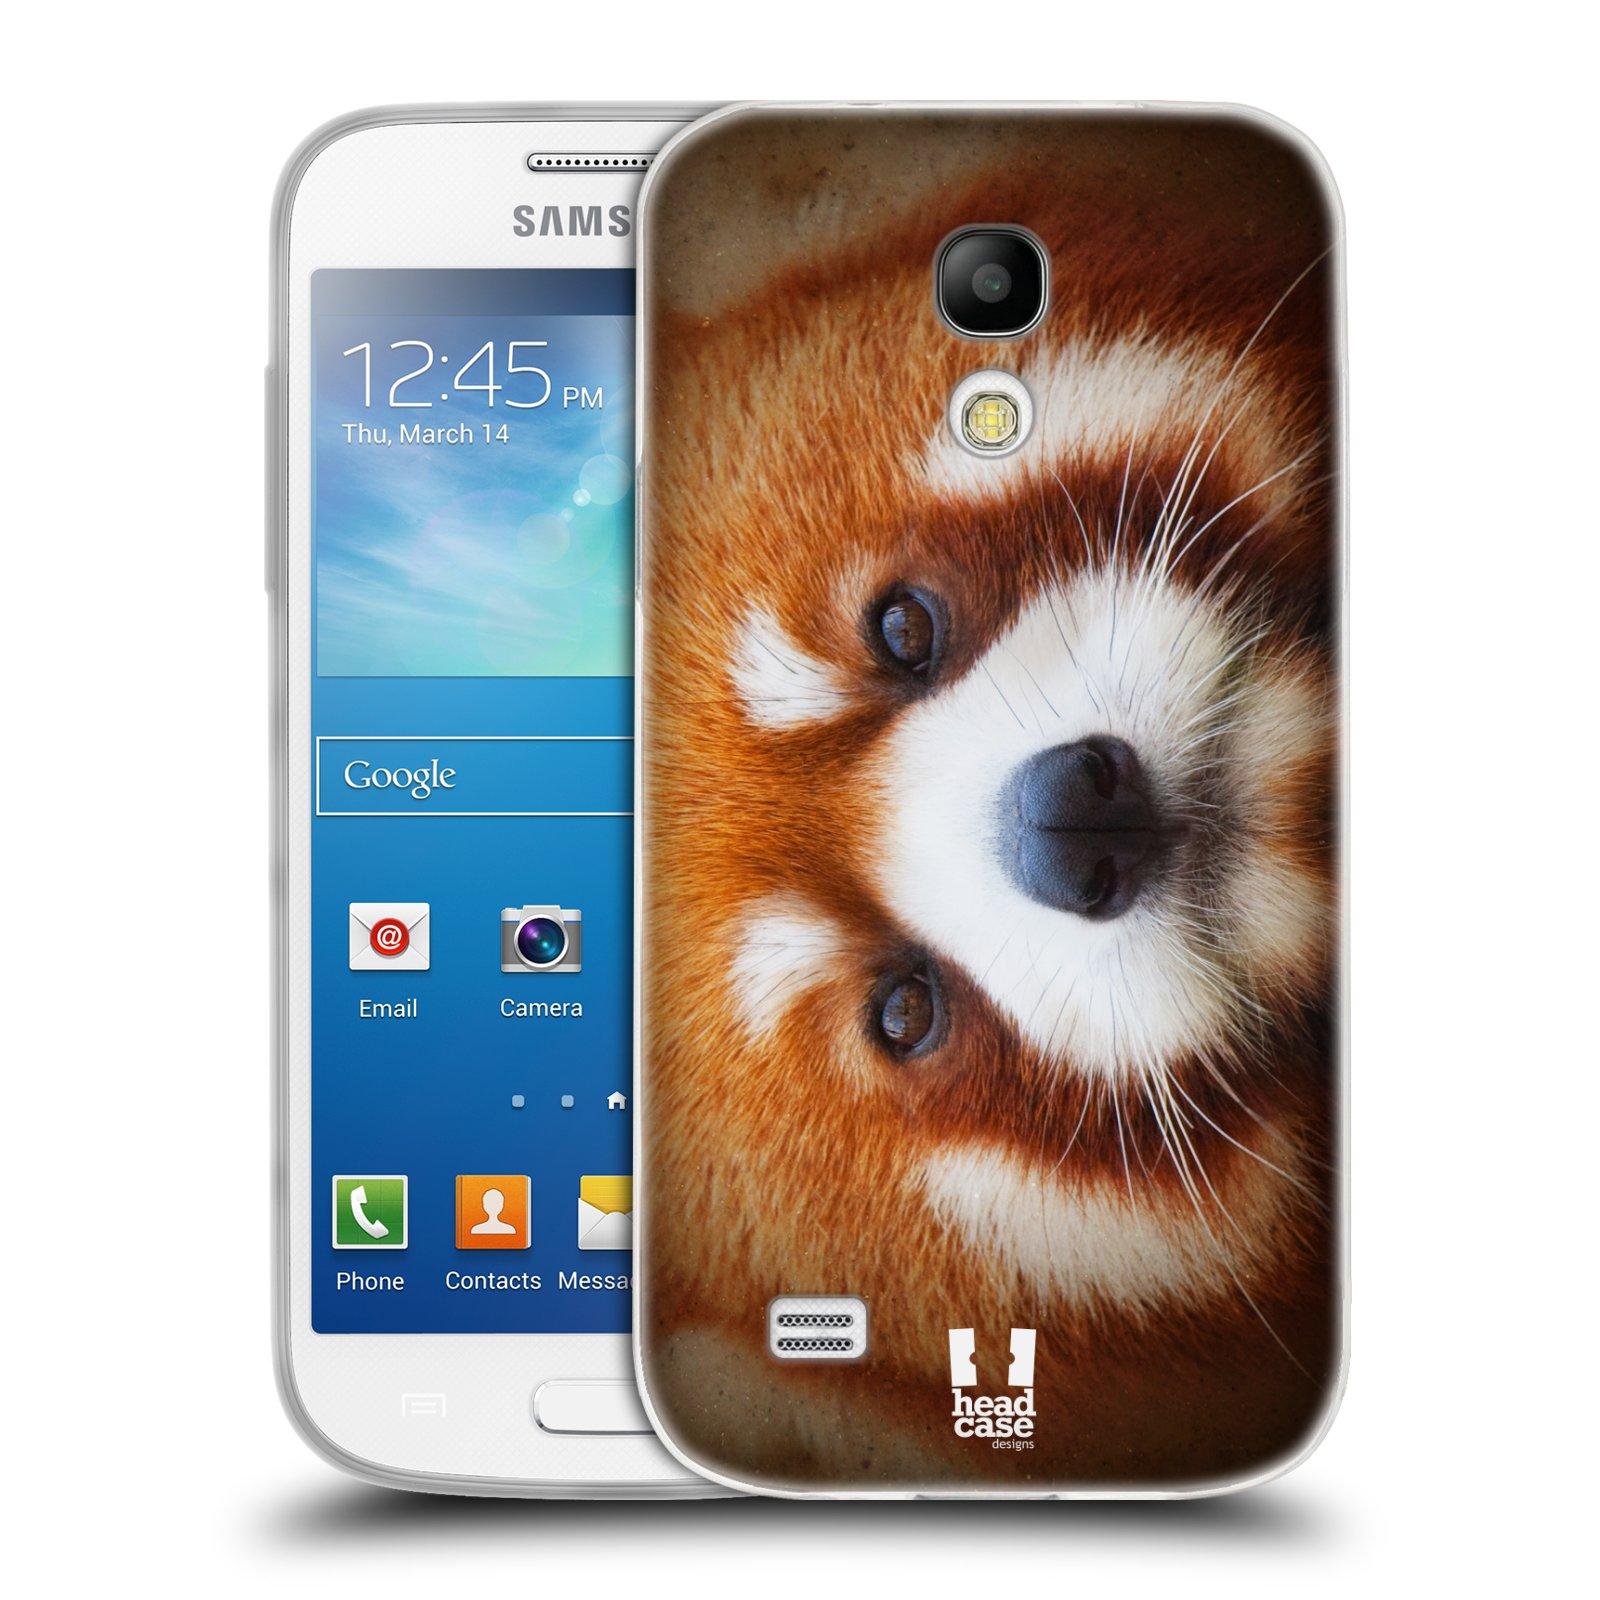 HEAD CASE silikonový obal na mobil Samsung Galaxy S4 MINI vzor Zvířecí tváře 2 medvěd panda rudá